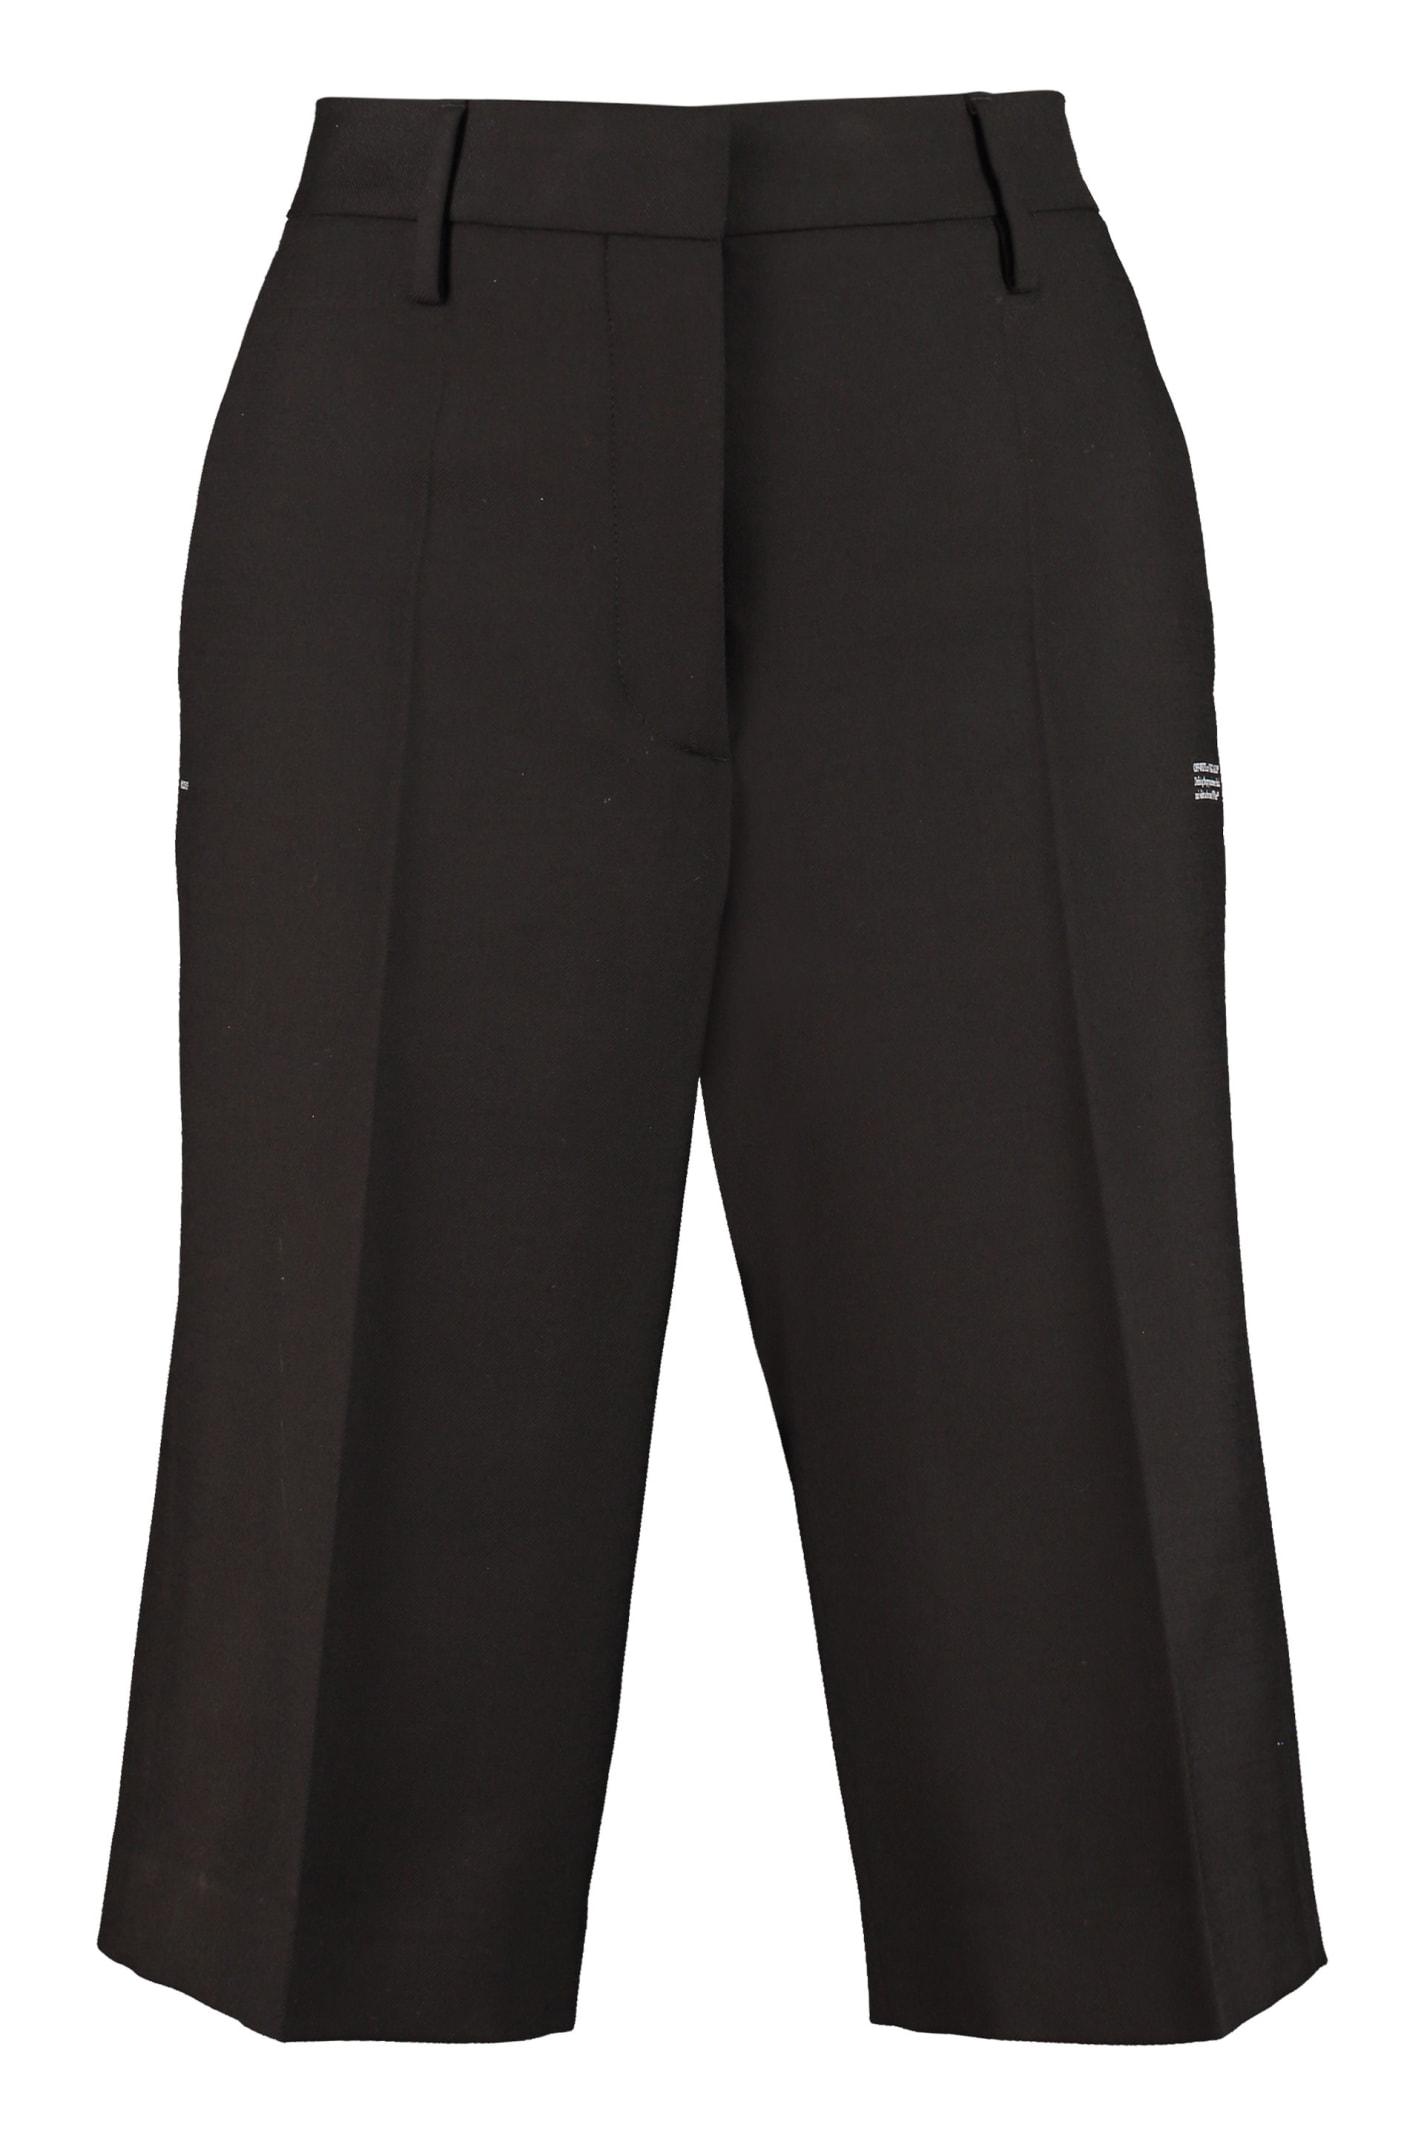 Off-White Wool Bermuda-shorts